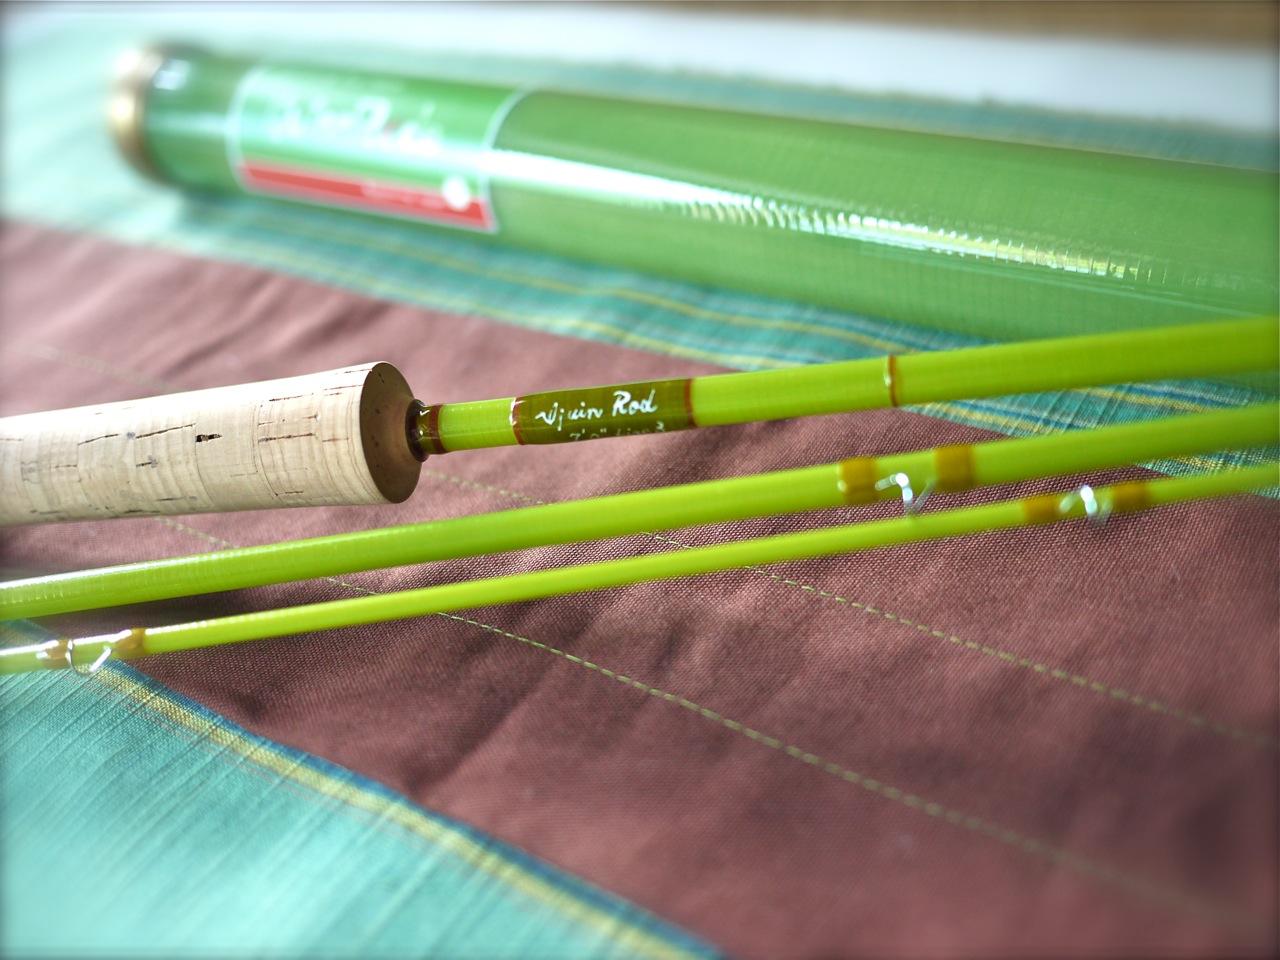 The fiberglass manifesto ijuin rod yomogi fly rod series for Fiberglass fishing rods